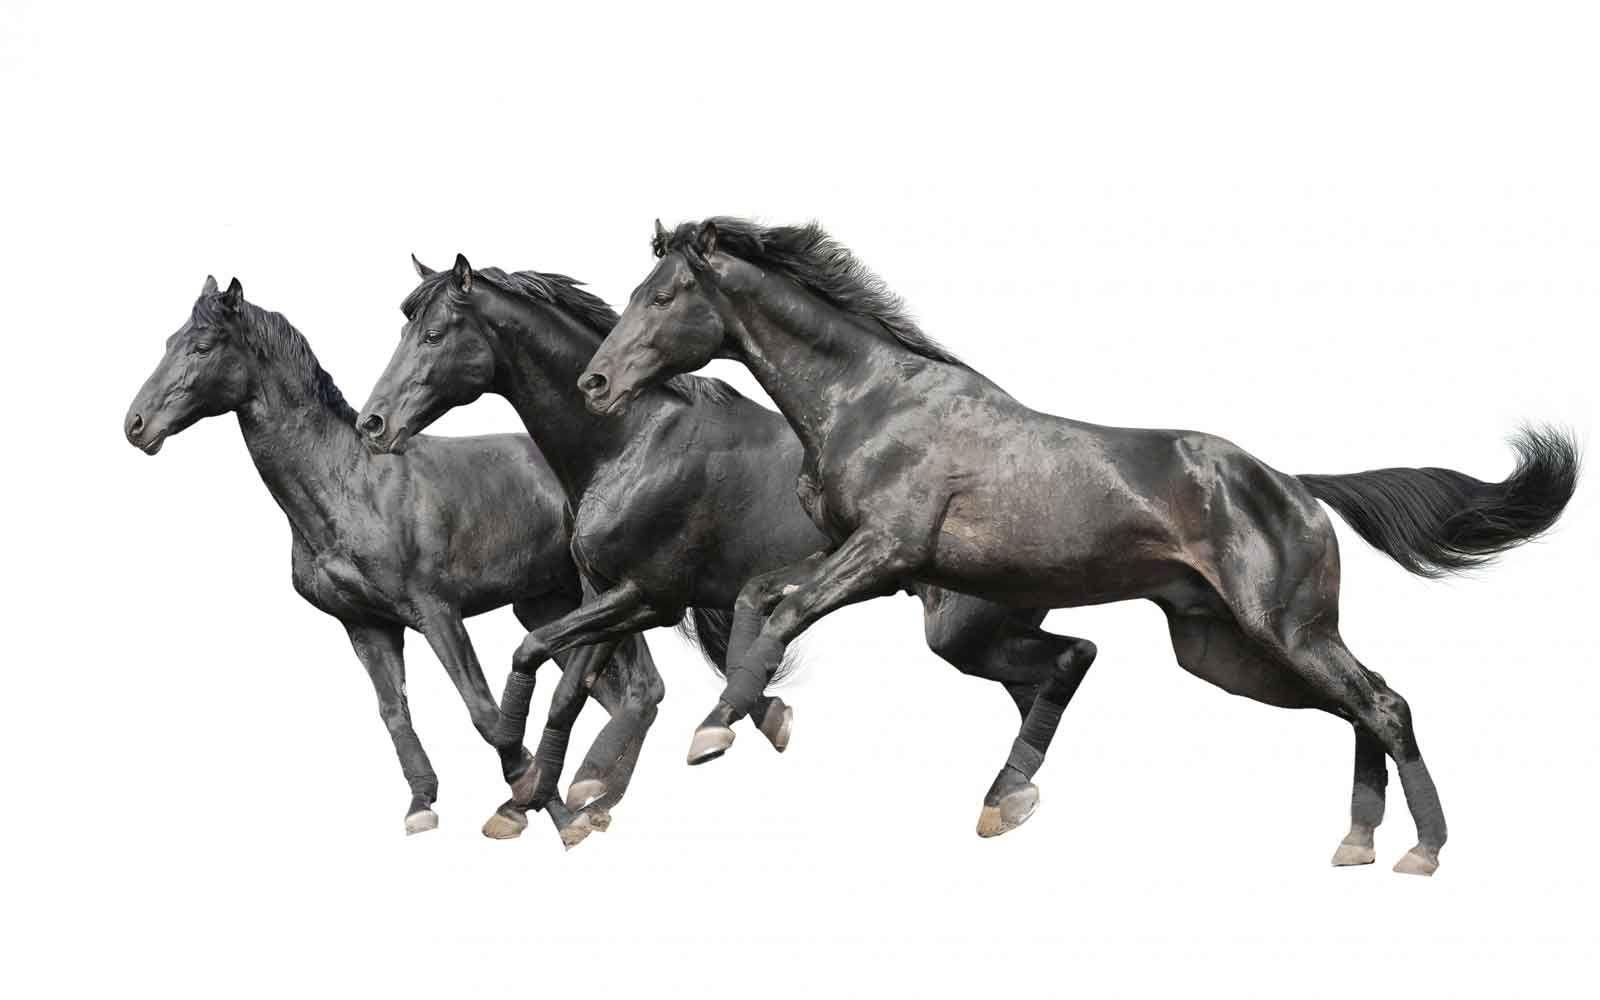 Fantastic Wallpaper Horse Collage - 588a552fb2c29e64c8b197d3bea676bd  Collection_266869.jpg